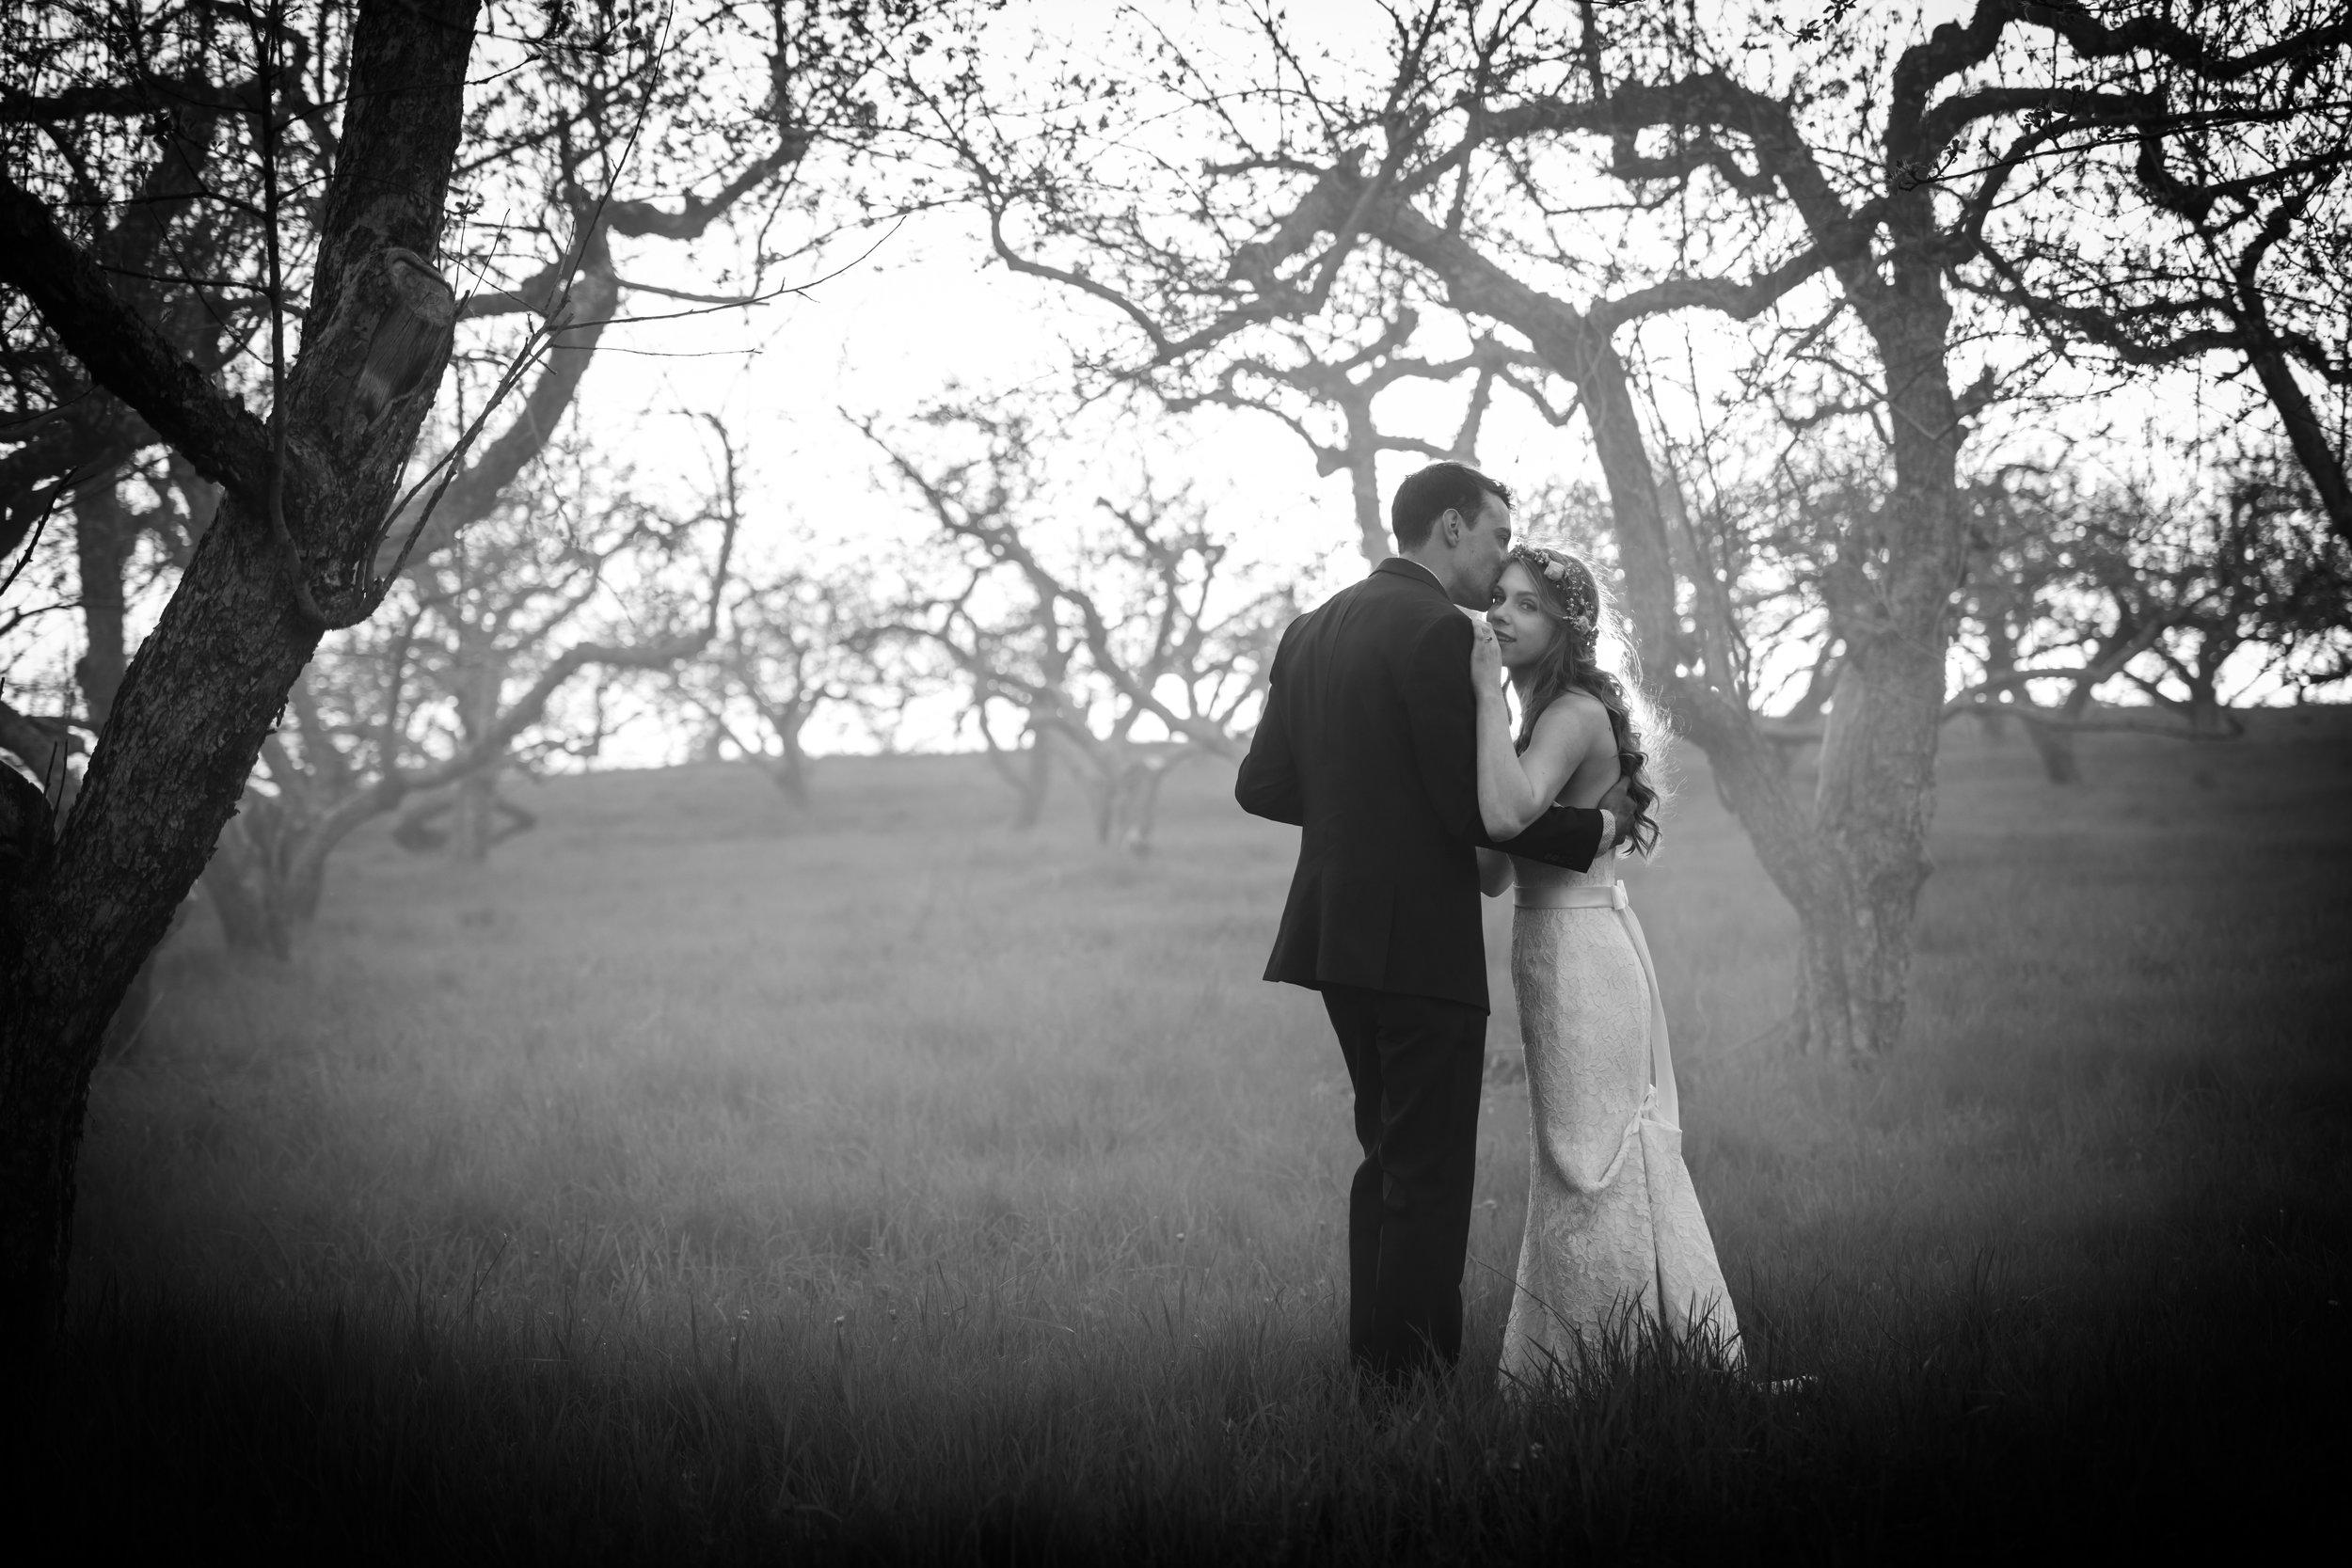 Bridal-5683-2.jpg